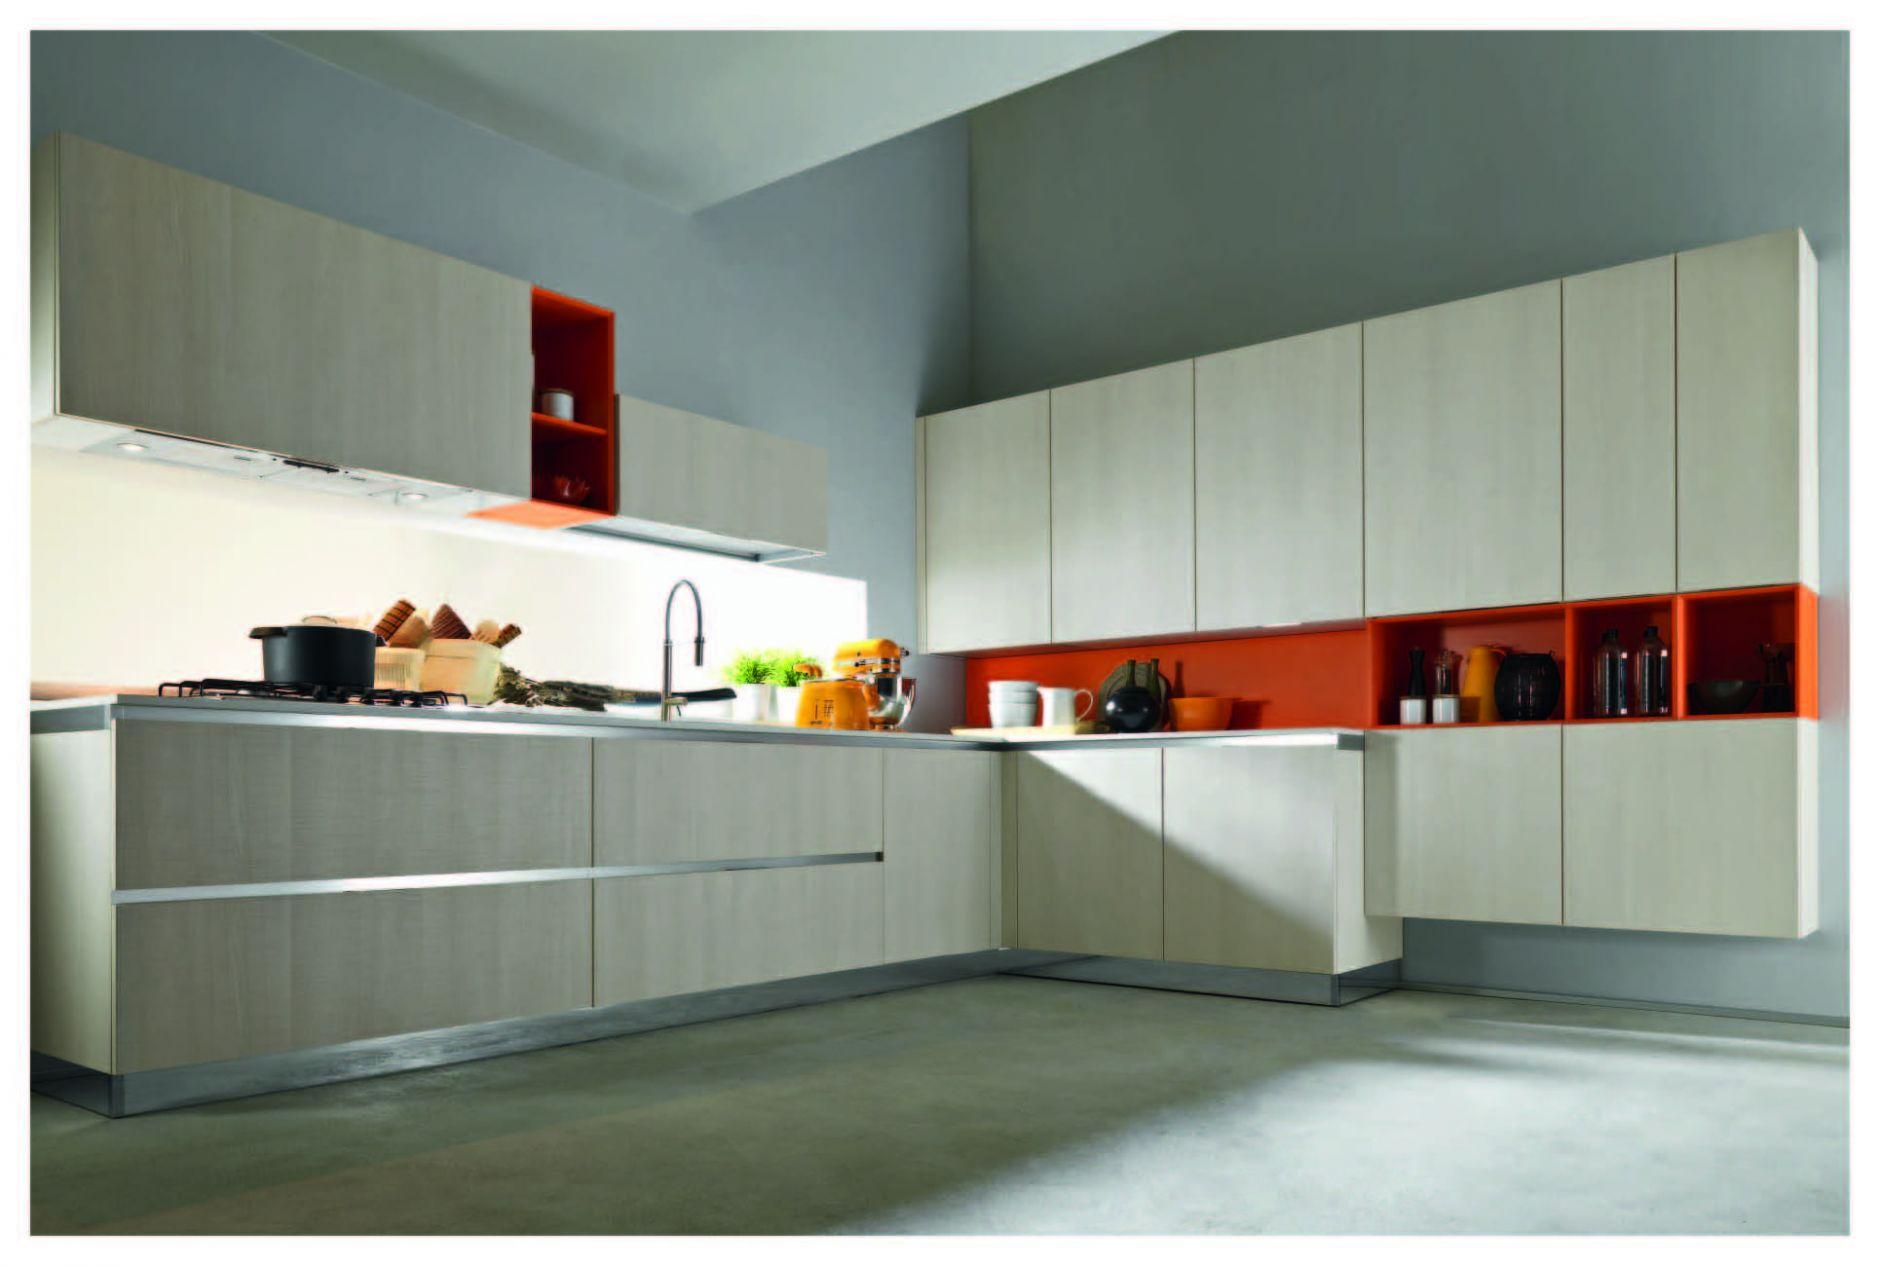 k chen k chen ligna serie adie m bel aus italien. Black Bedroom Furniture Sets. Home Design Ideas